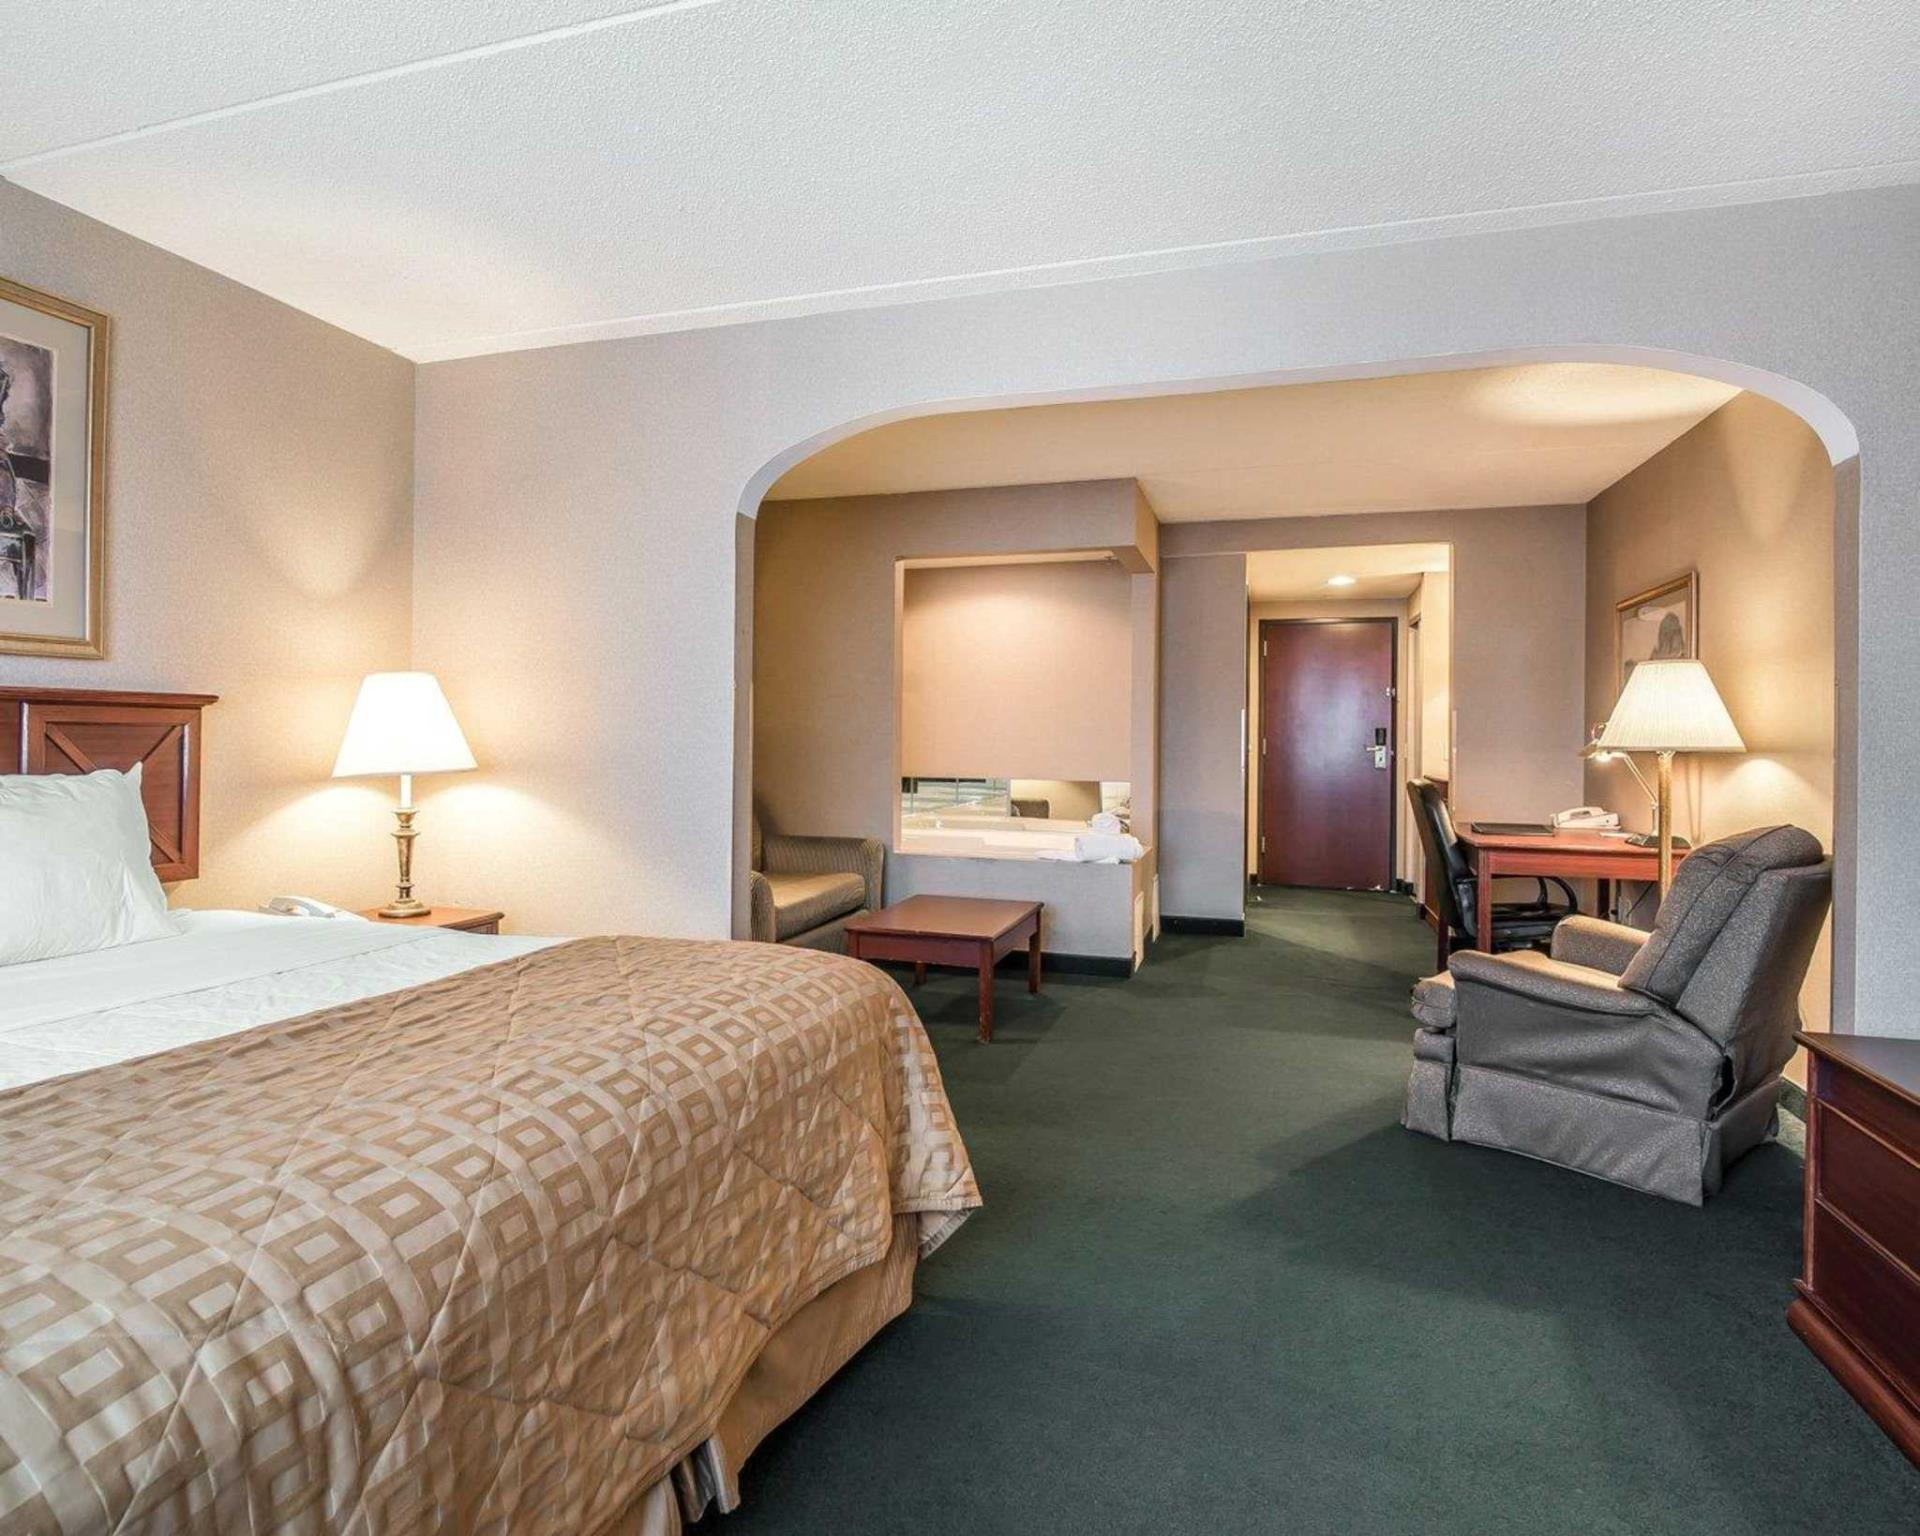 Clarion Hotel Oneonta In Oneonta Ny Room Deals Photos